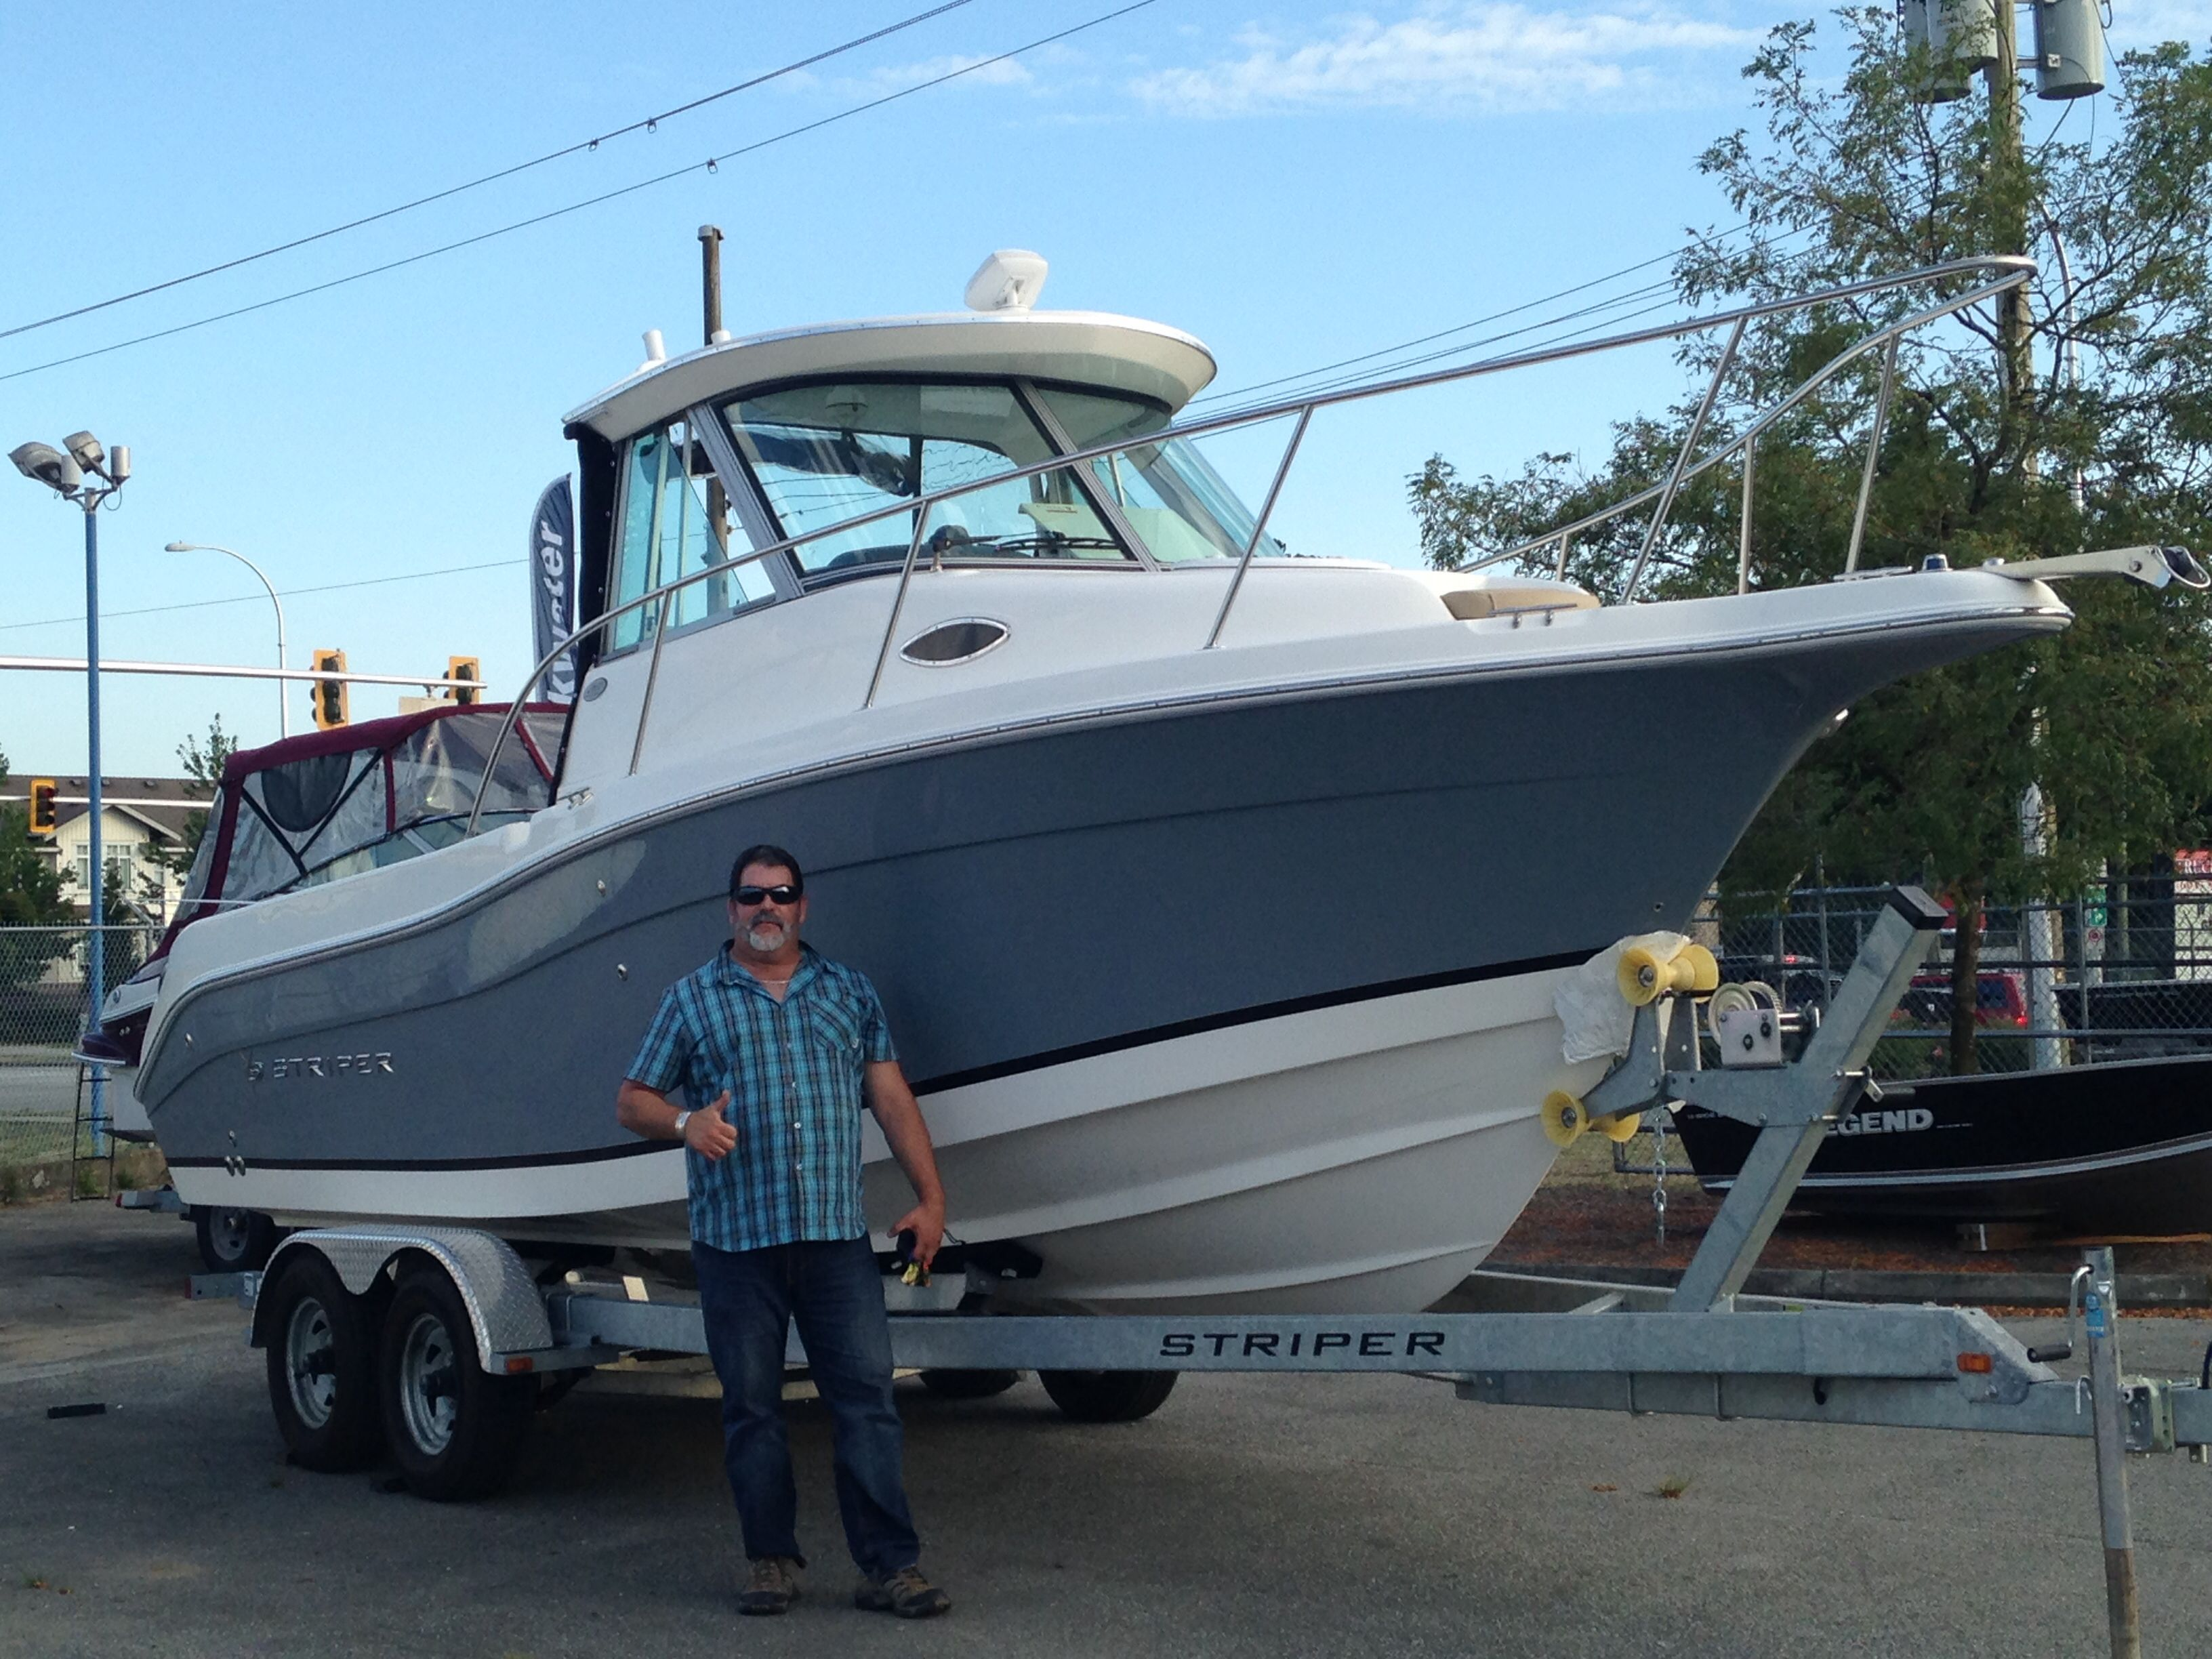 2012 Seaswirl Striper 2601 WA Offshore fishing boats